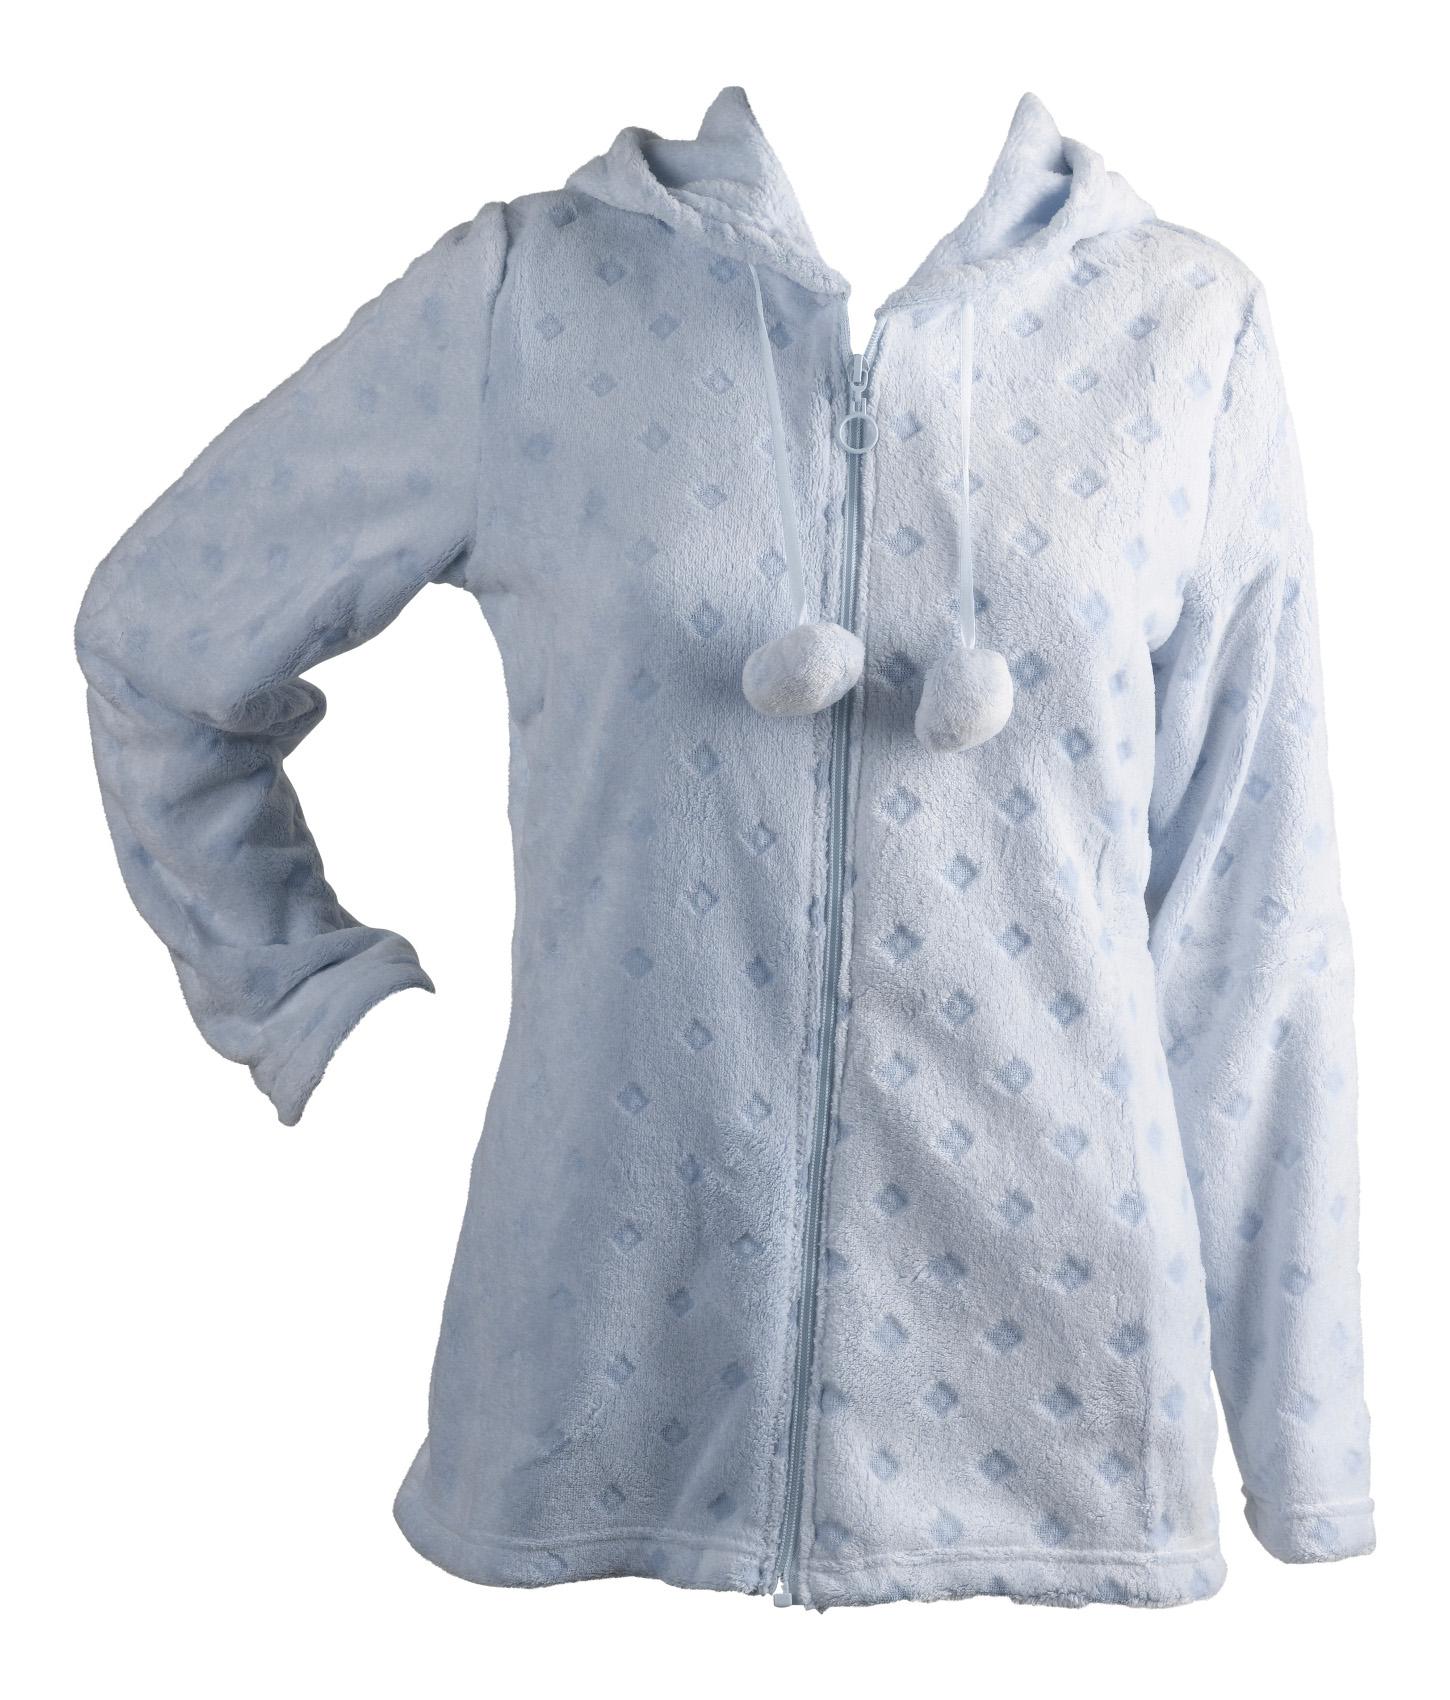 b01a85c1504 Womens Soft Fleece Bed Jacket Ladies Hooded Zip Up Diamond Design House Coat